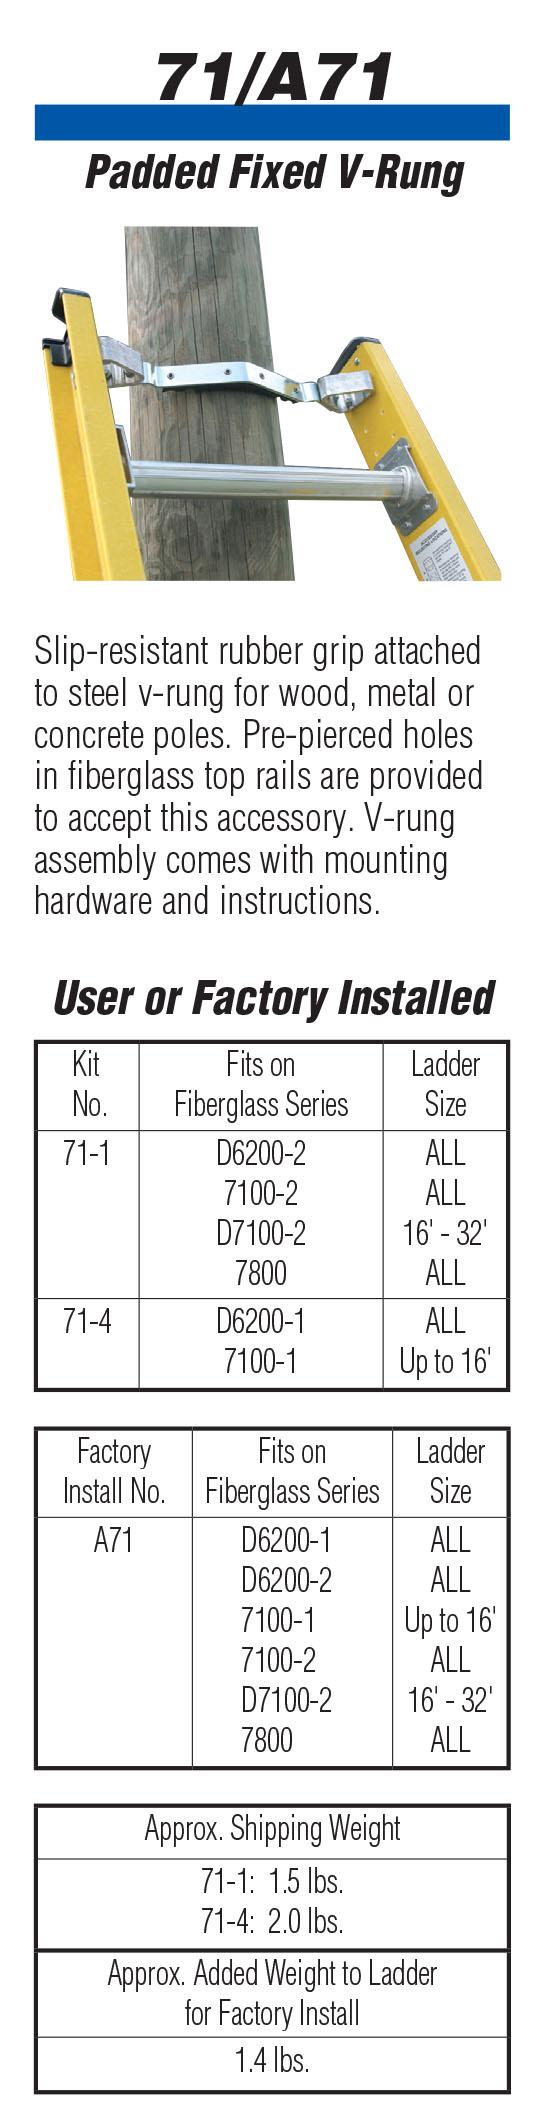 71-x-v-rung-catalog-page.jpg